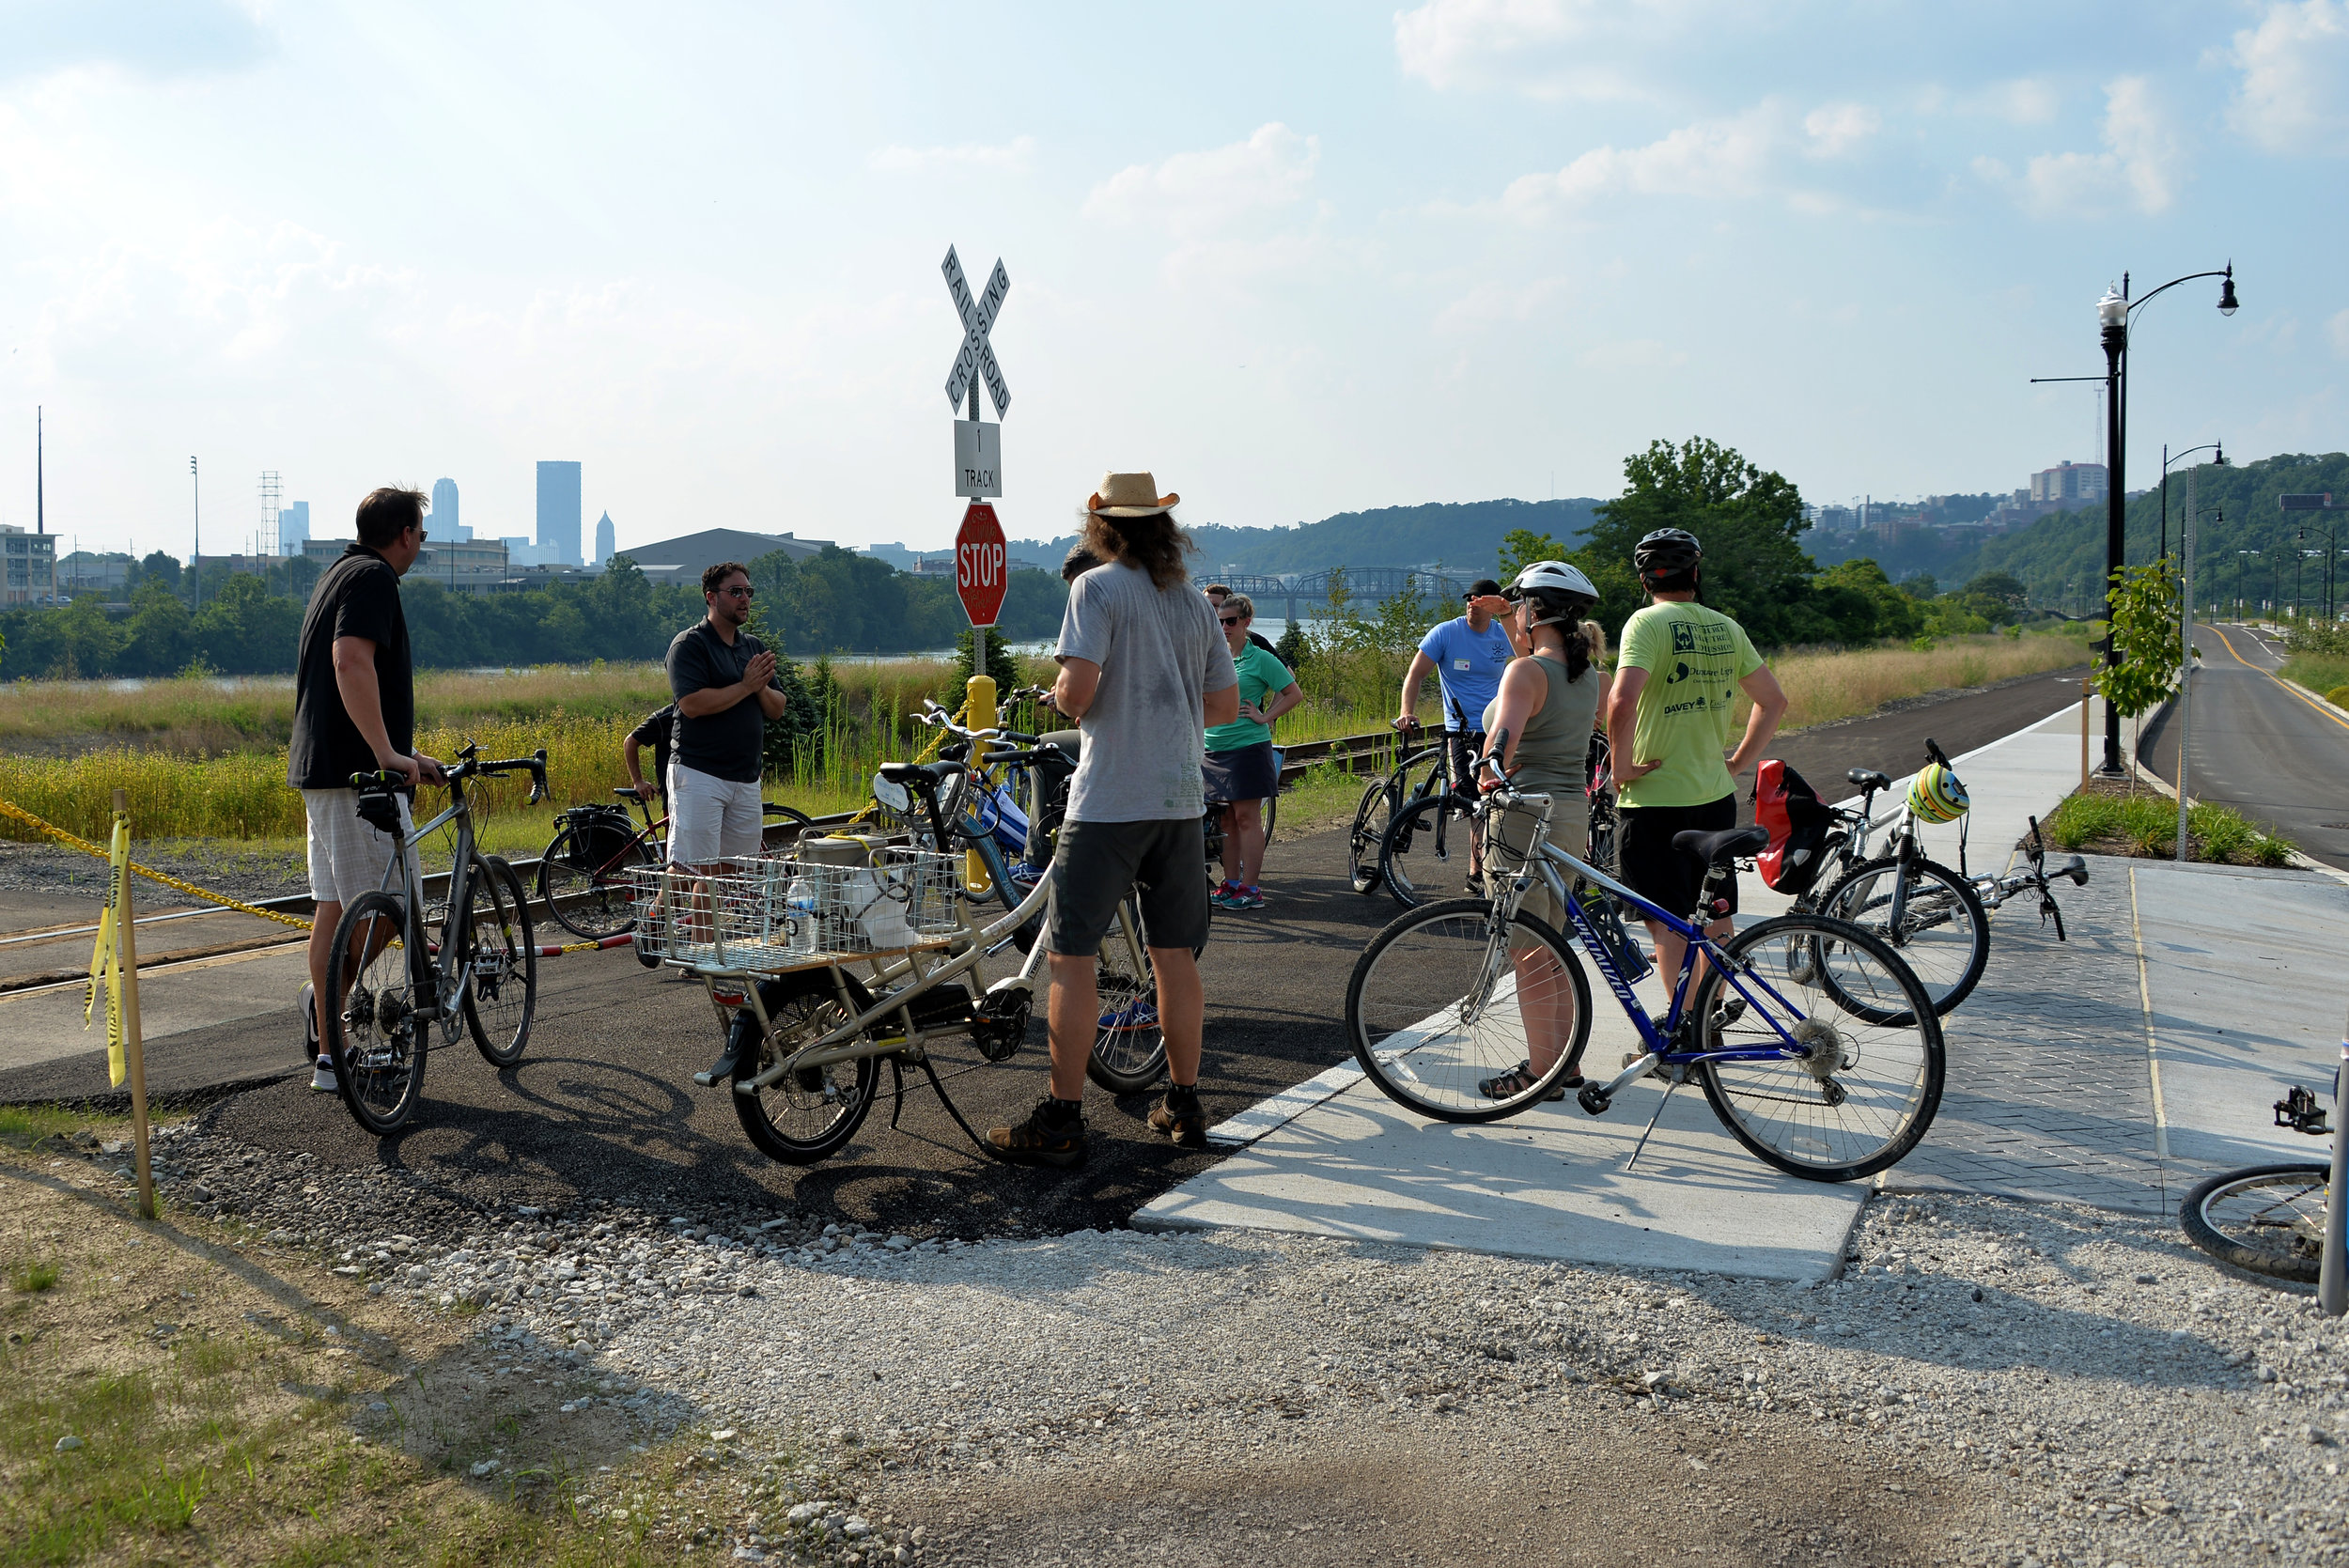 almono-gba-bike-tour_36049379745_o.jpg